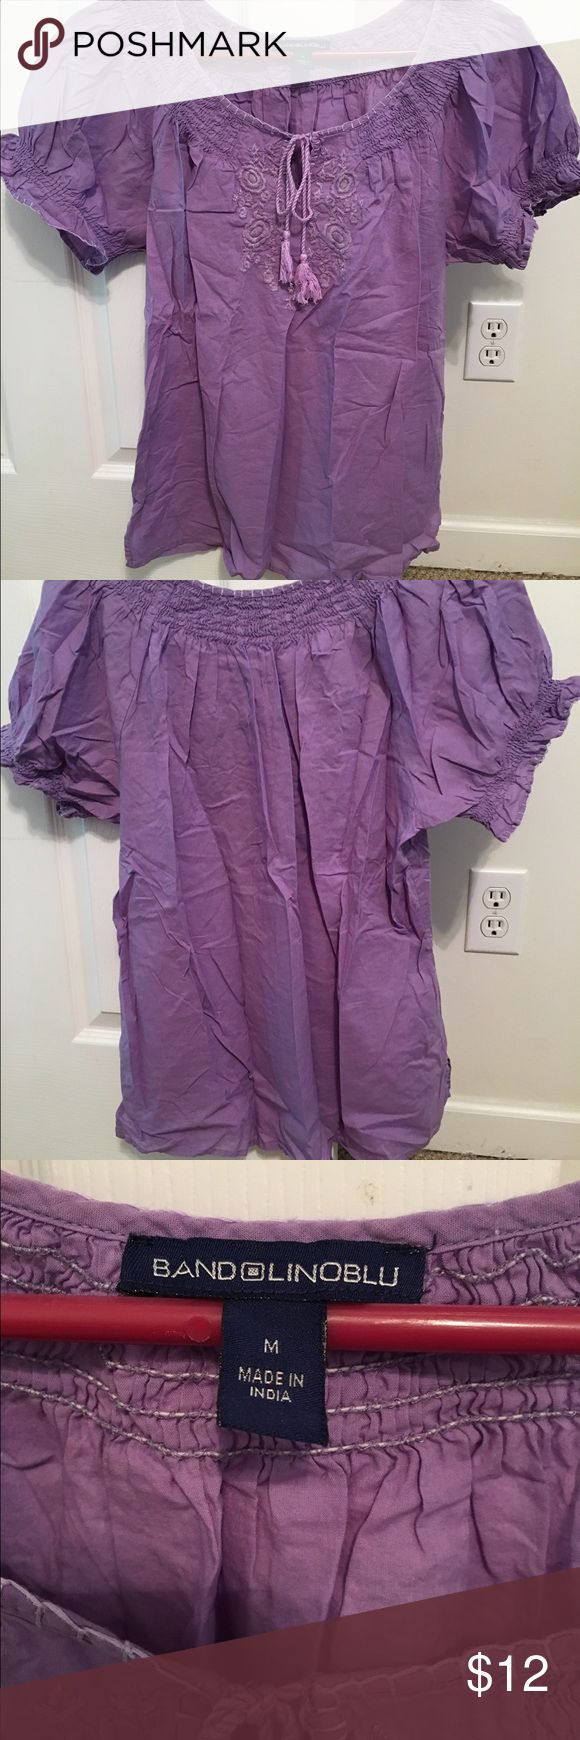 Bandolinoblu tunic top Bandilinoblu purple smock-style top in medium with embroidery at the neckline and side splits at hemline. Bandolino Tops Tunics